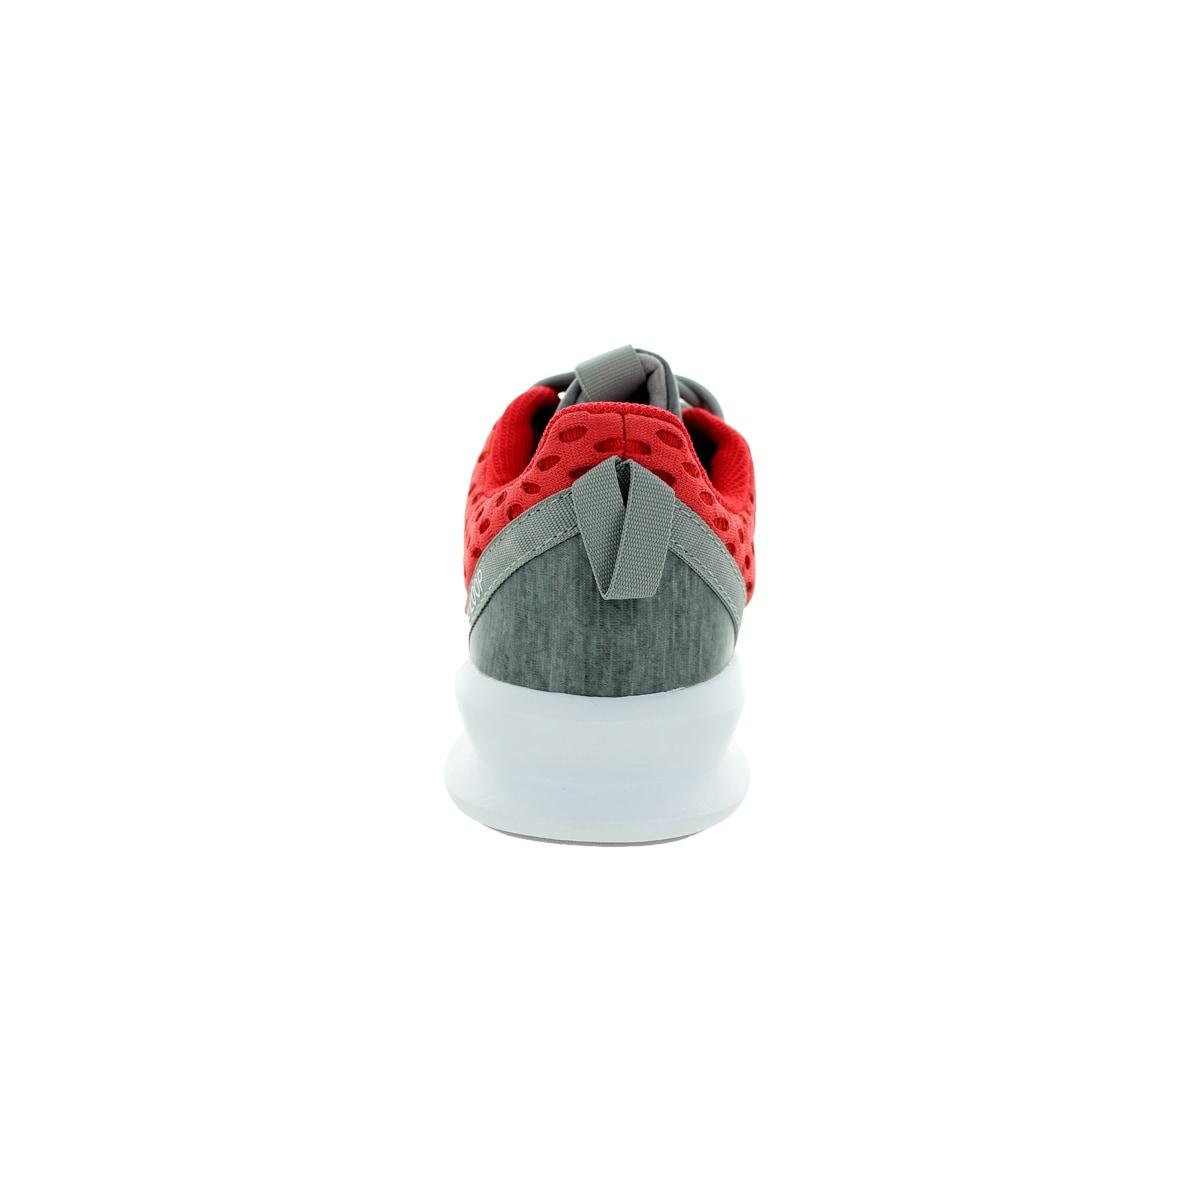 70dada310 Shop Adidas Women s Sl Loop Racer W Originals Tomato White  Running Shoe -  Free Shipping Today - Overstock.com - 12175259